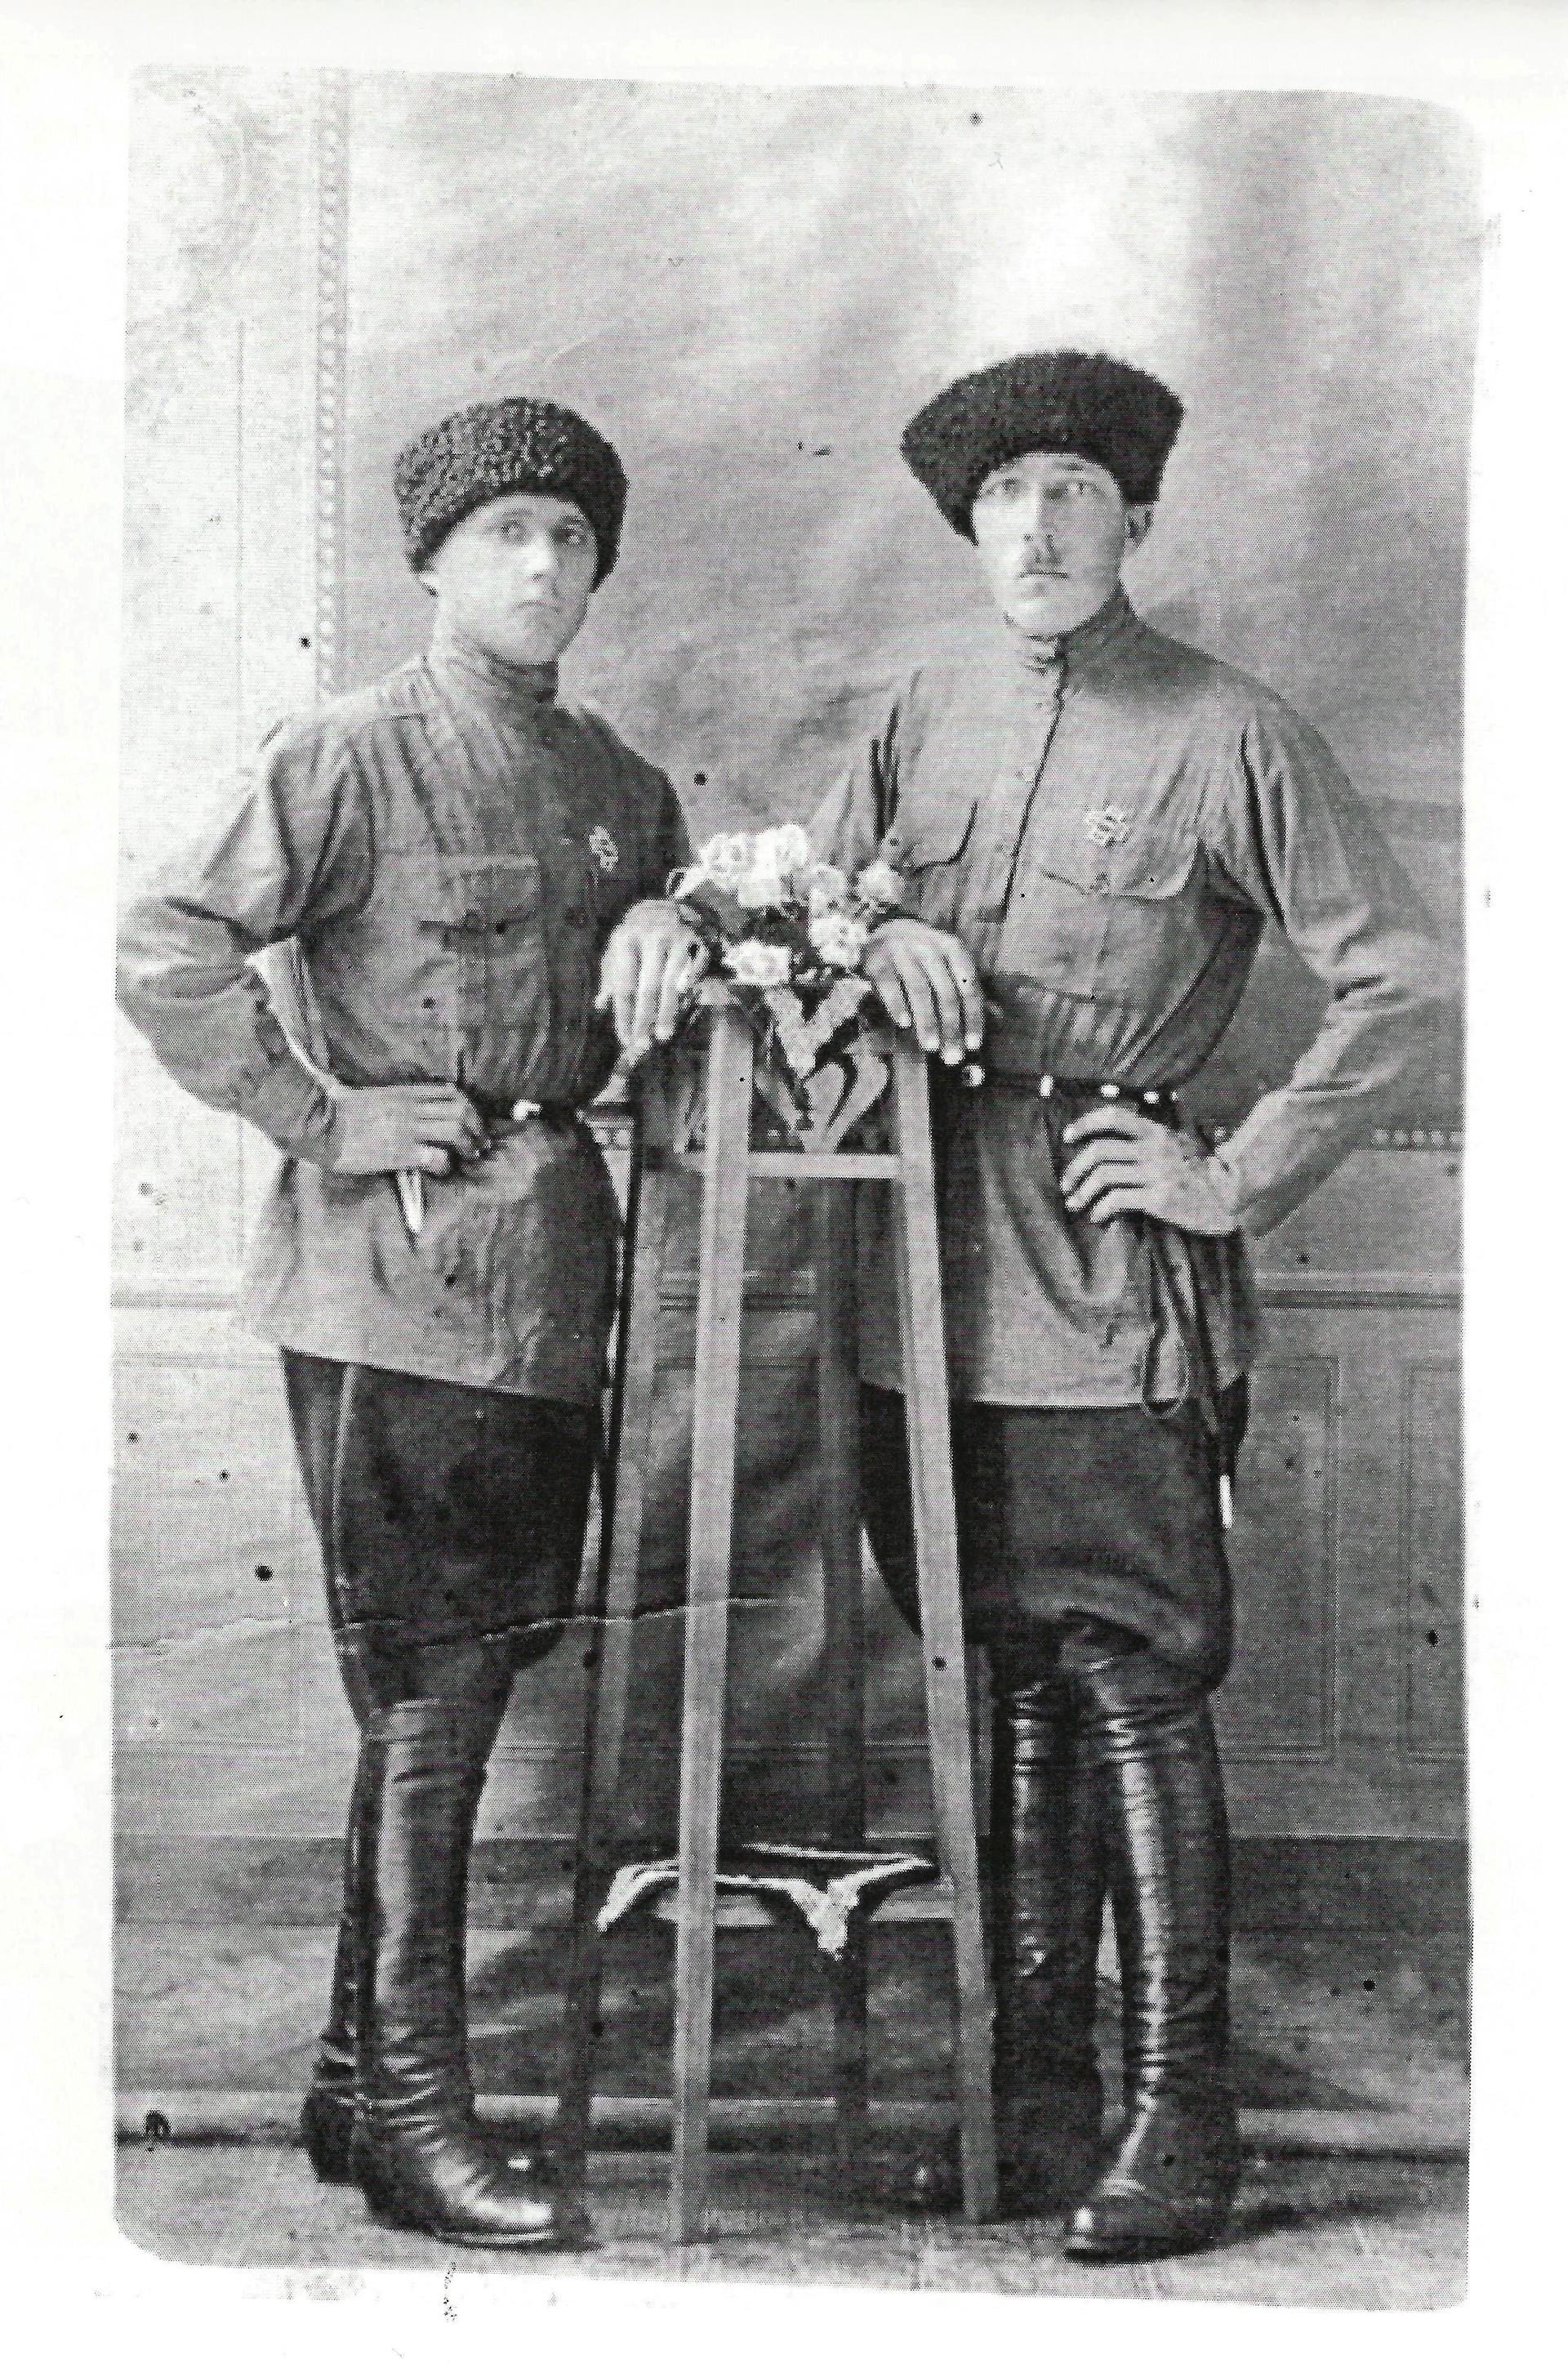 Dva kozaka v emigraciji, oba z znakom Galipoli 1920-1921